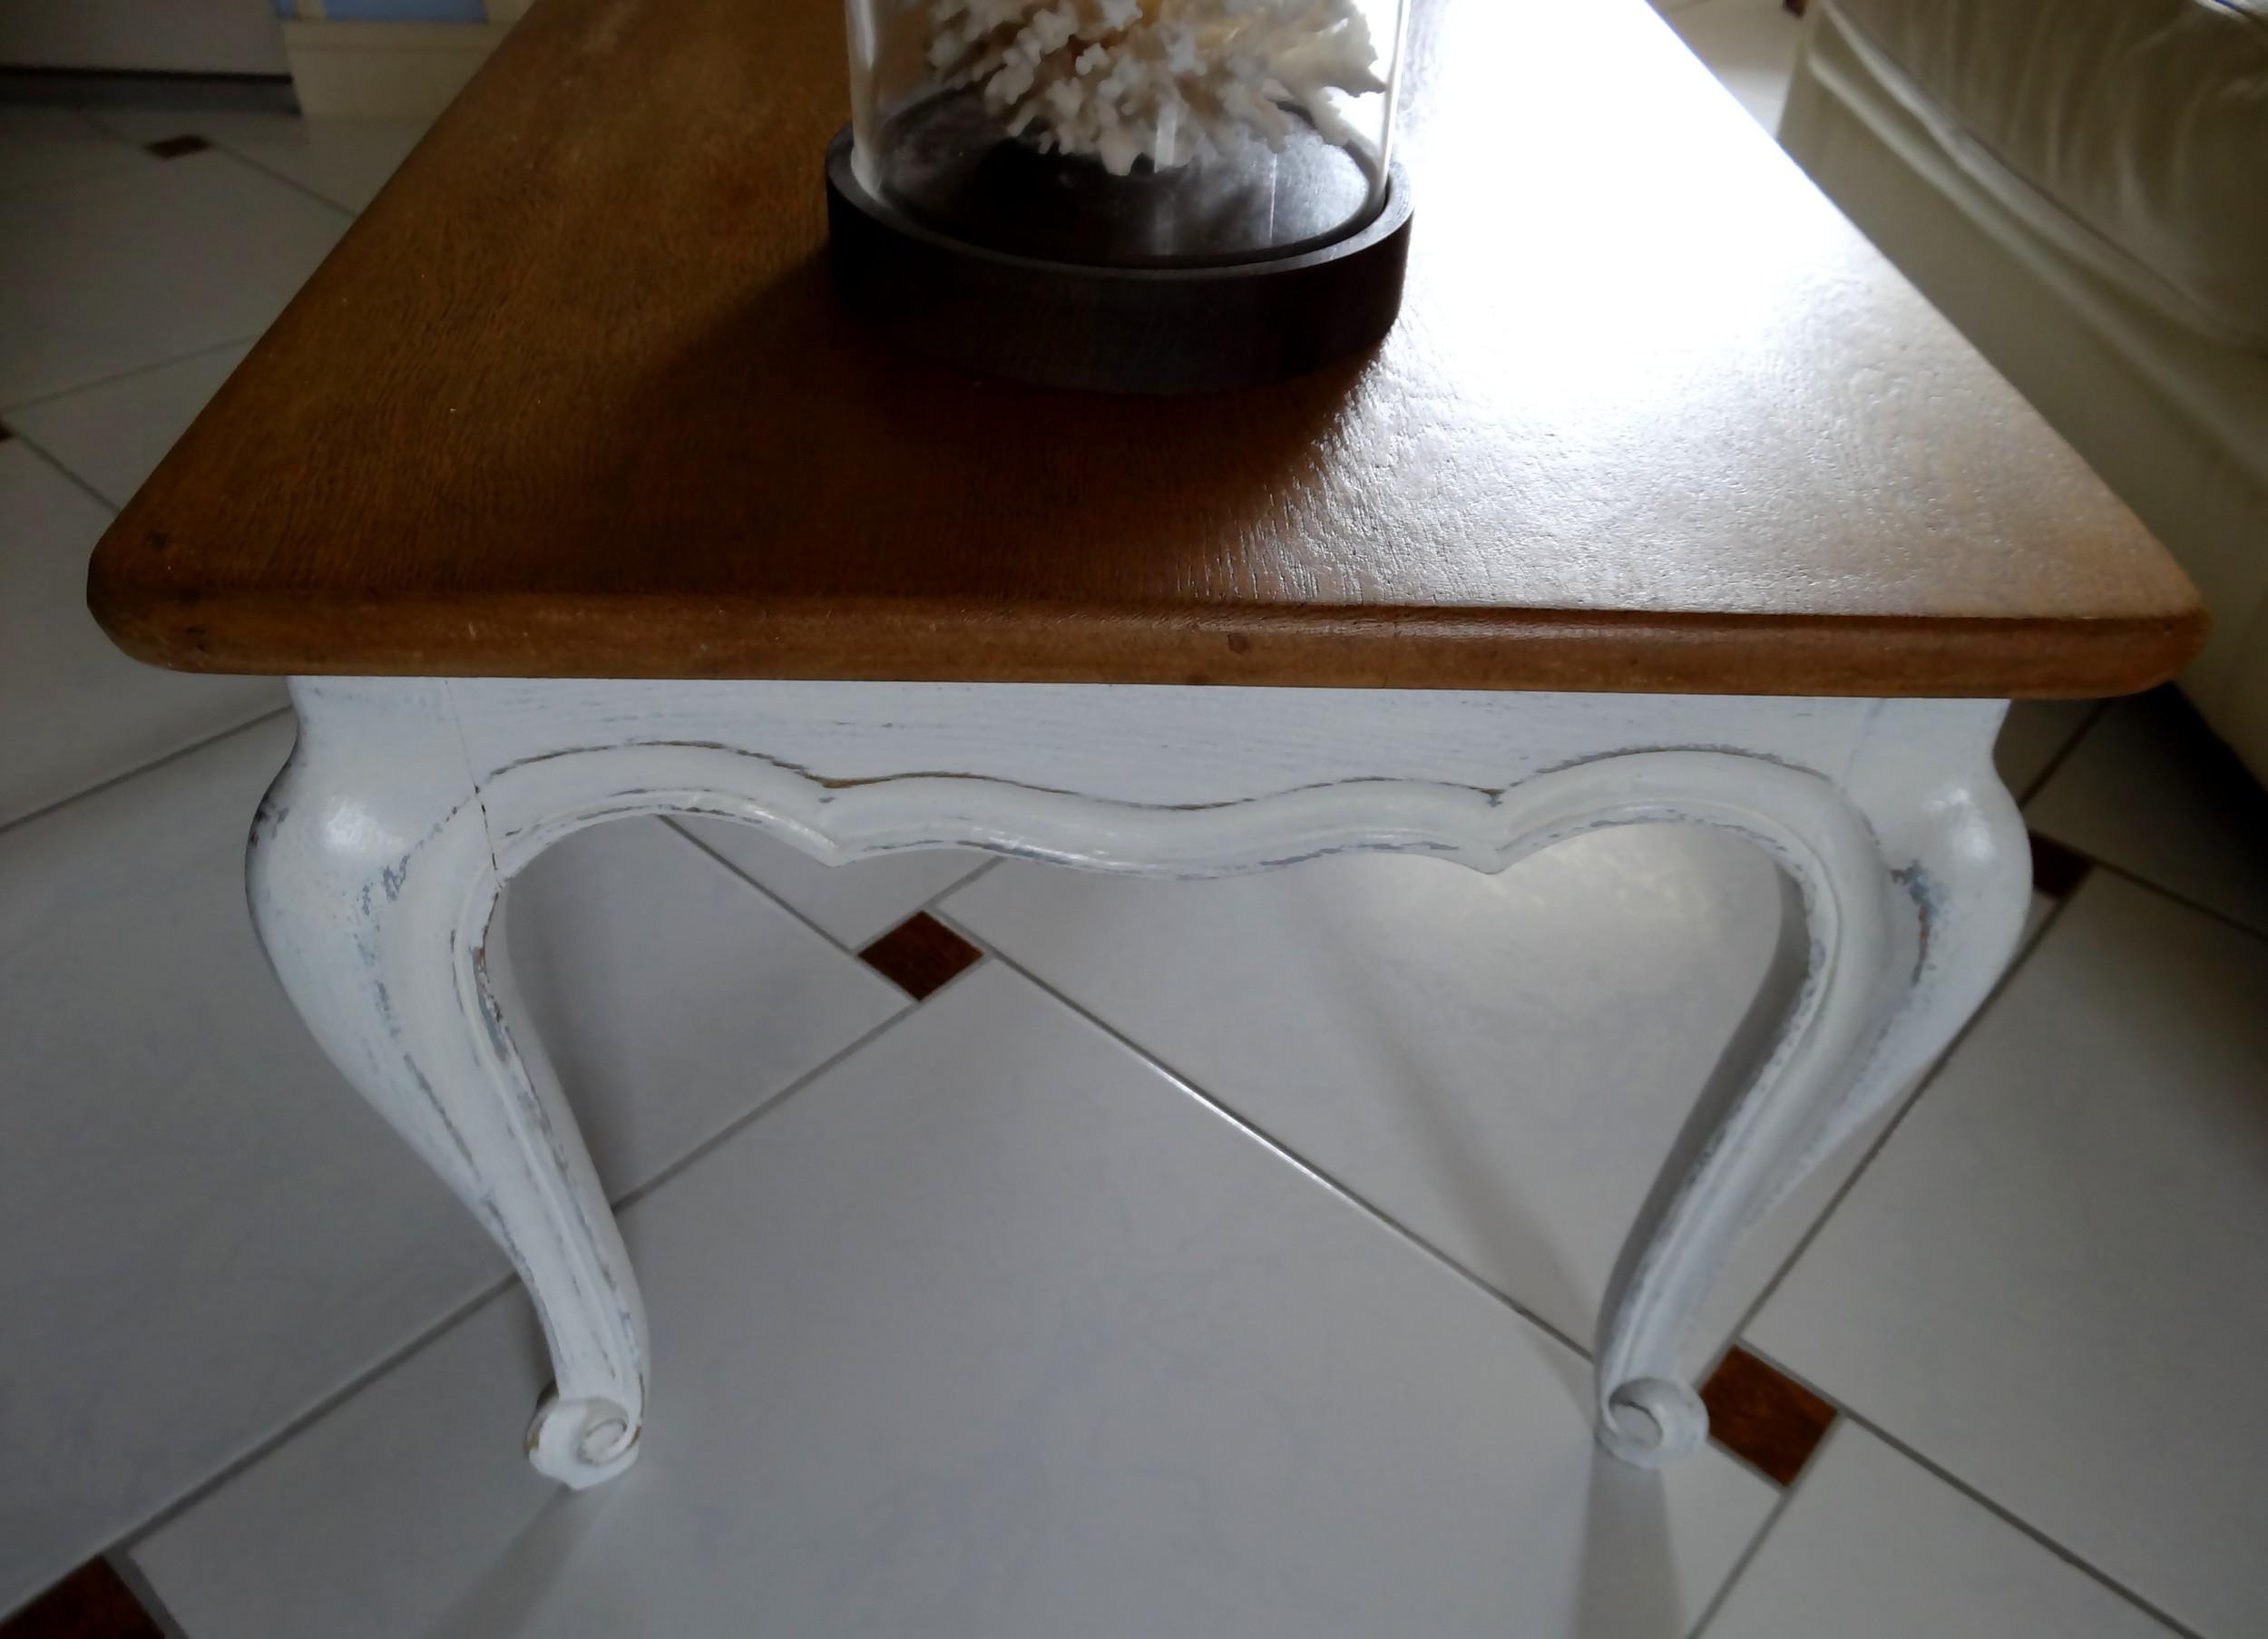 Jolie table basse style louis xv pi tement patin blanc et - Table basse peinte ...